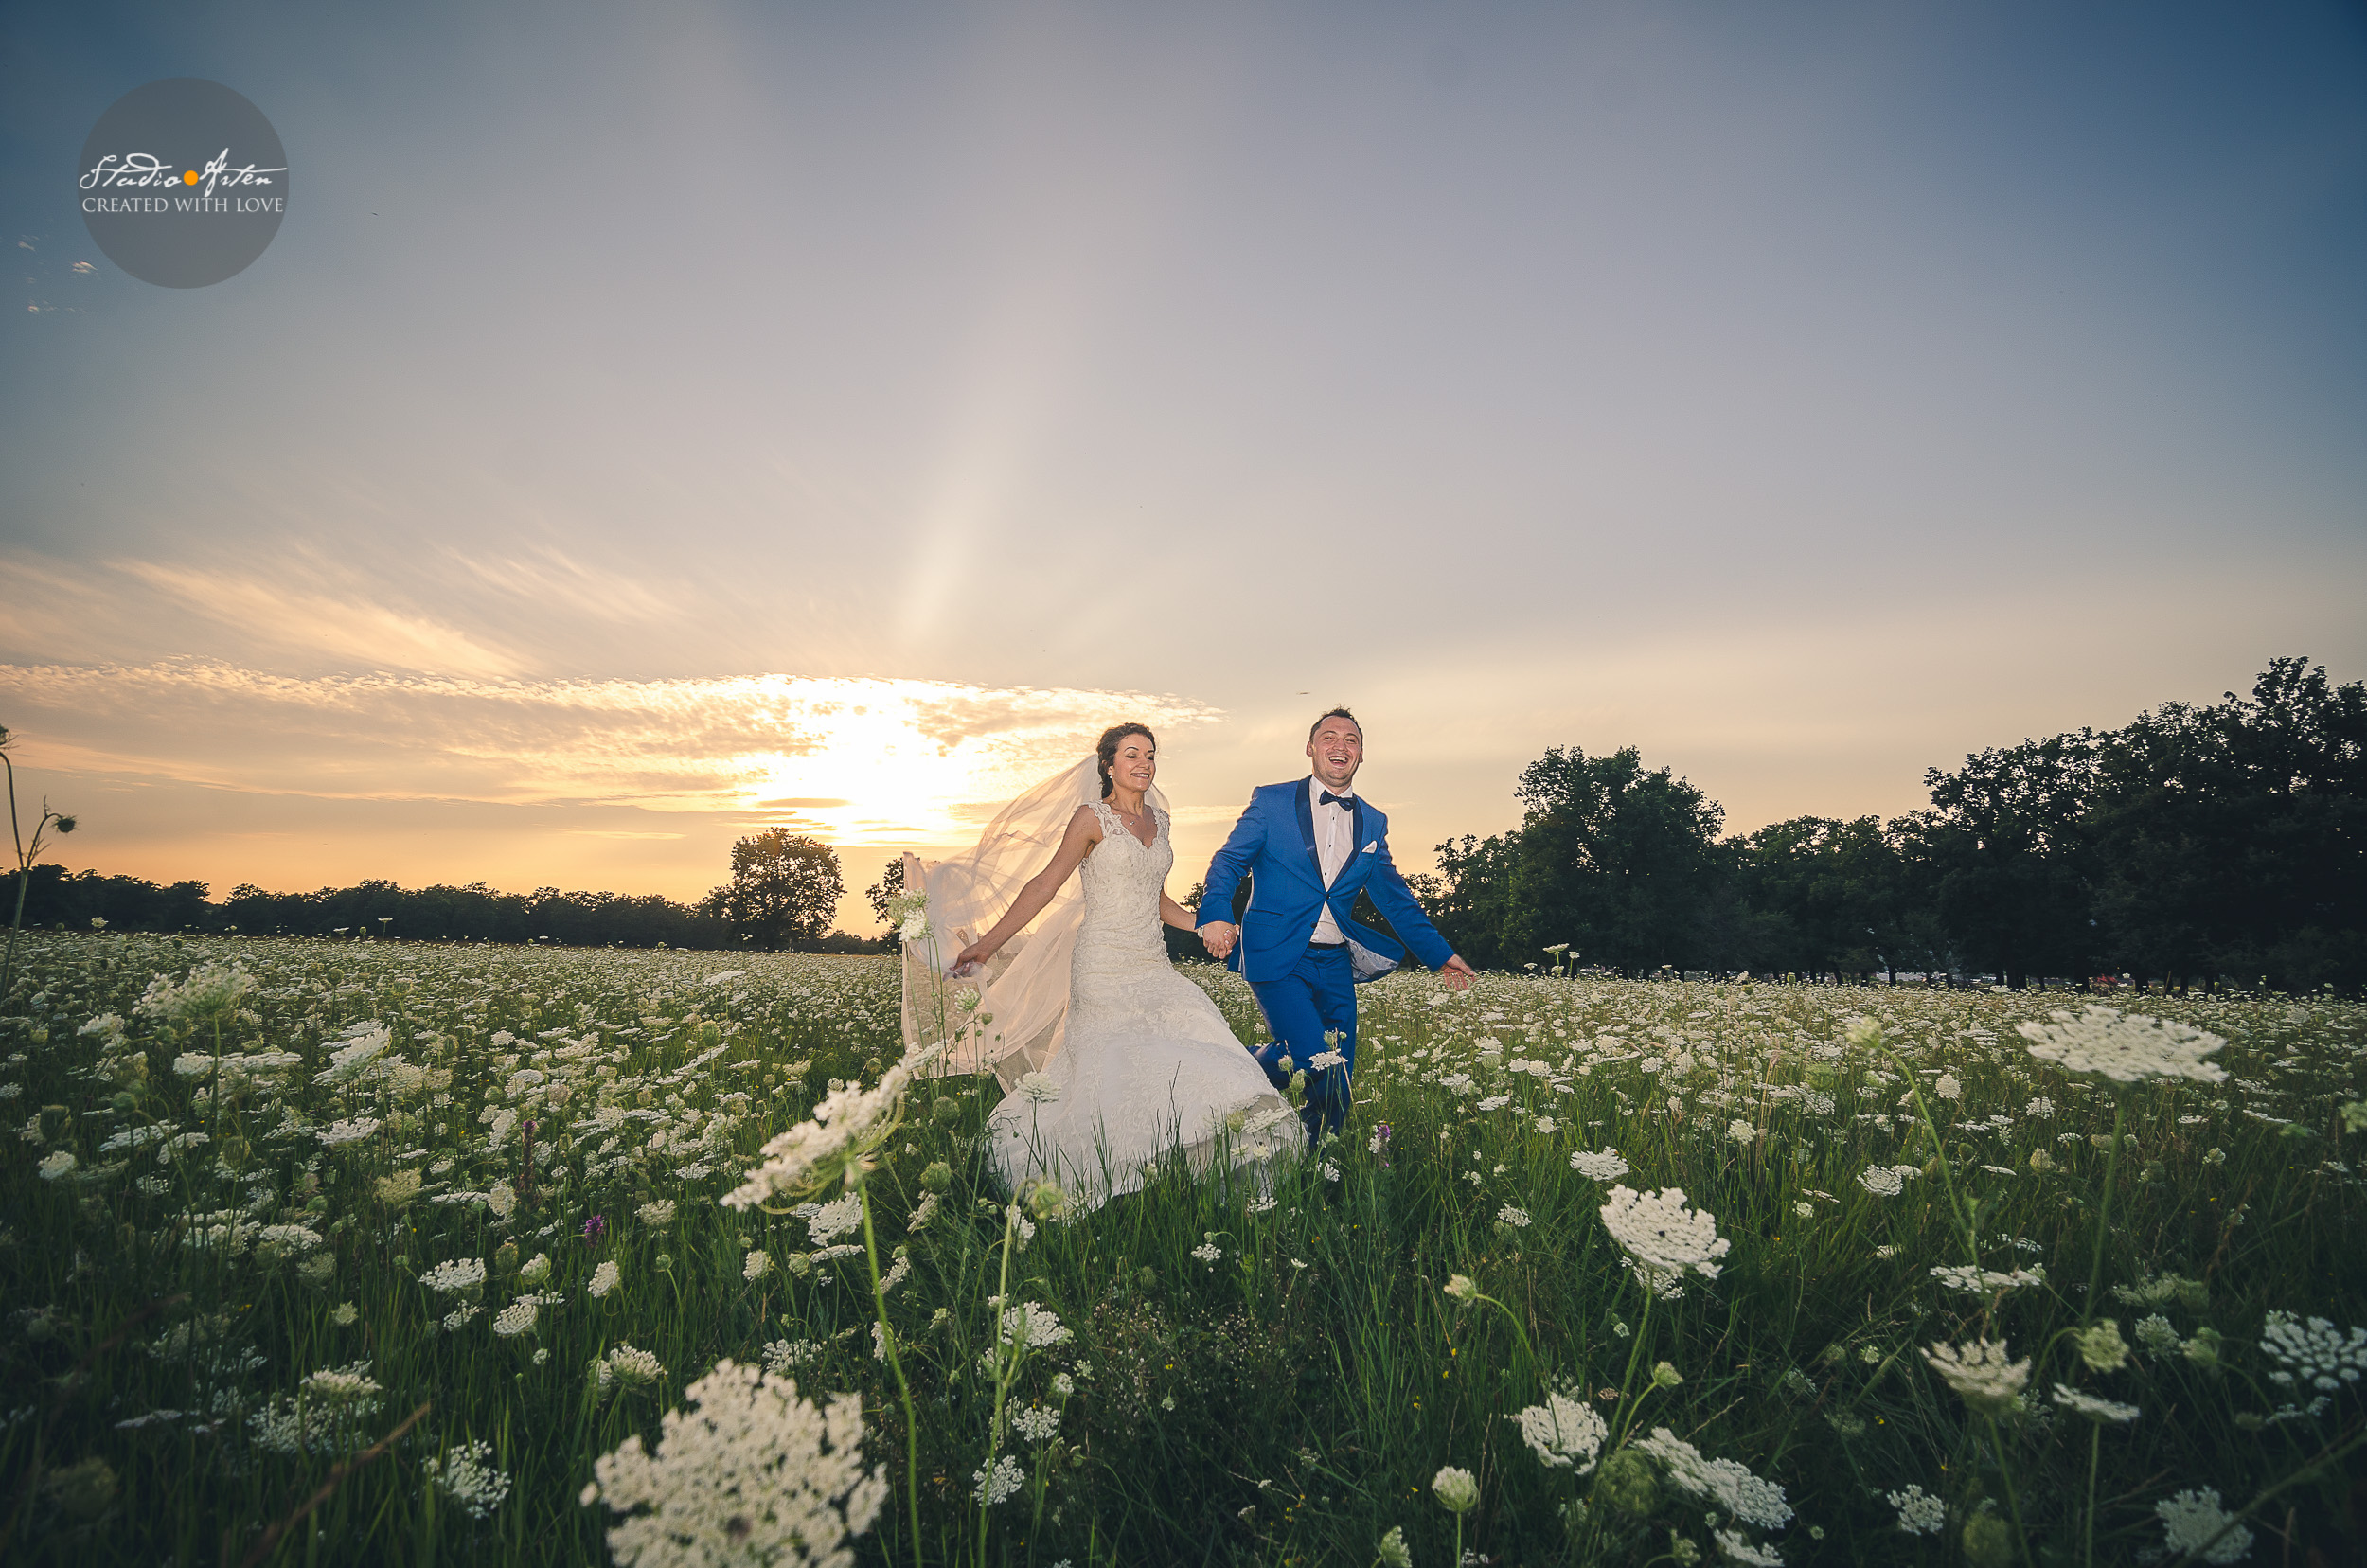 fotosedinta dupa nunta, camp cu flori, miri pe camp, fotograf profesionist, miri care alearga,